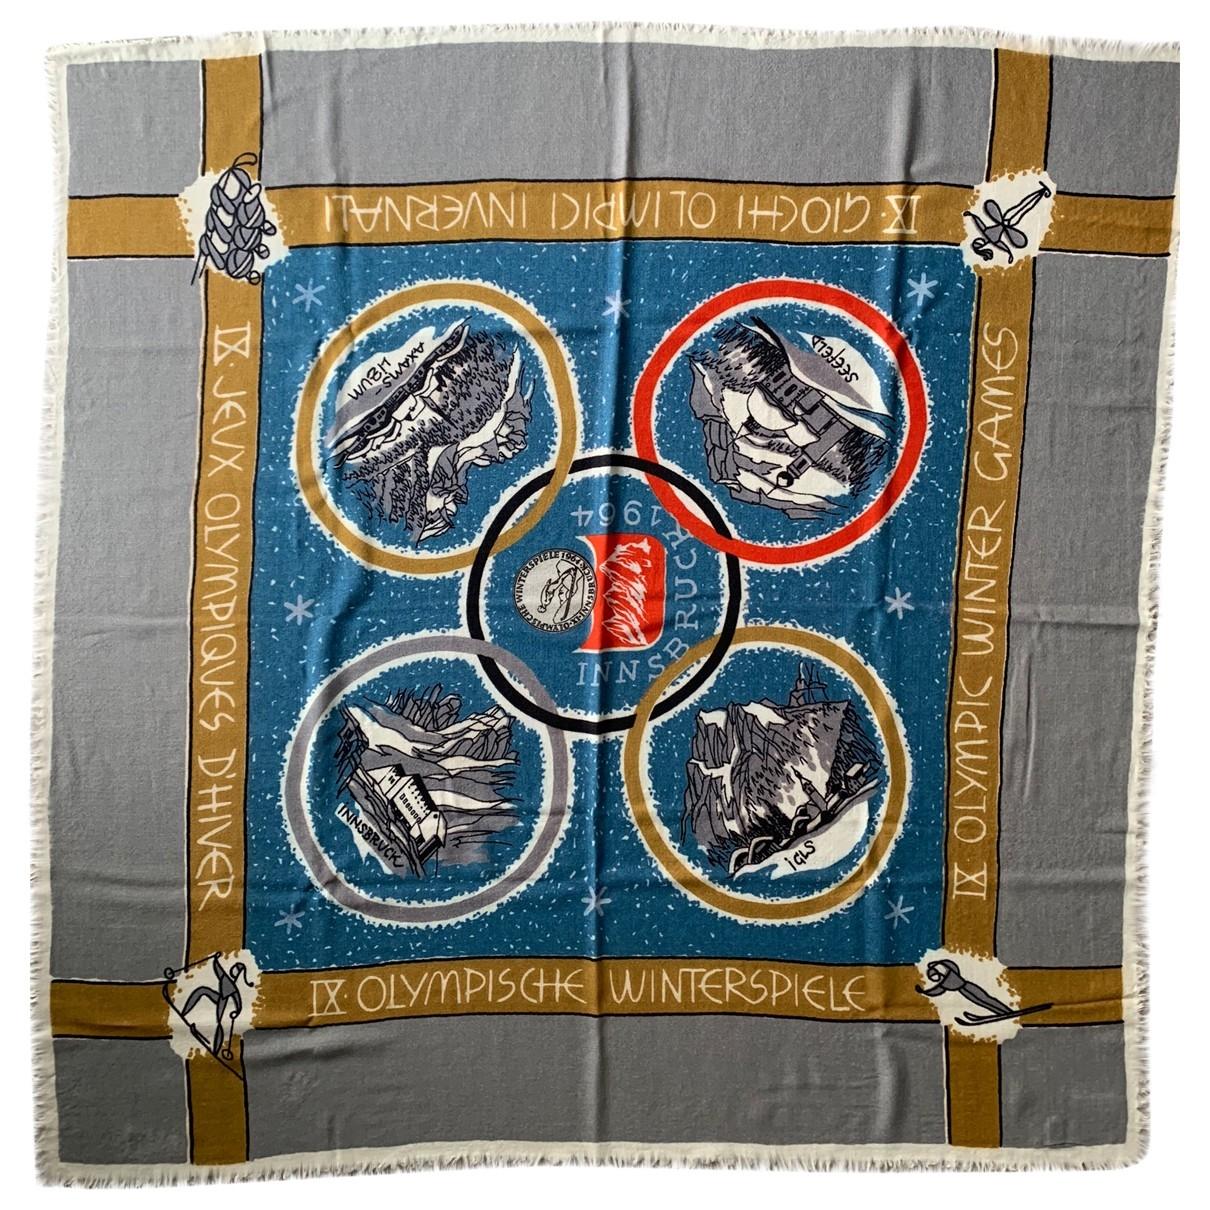 Pañuelo / bufanda de Lana Franco Ferrari